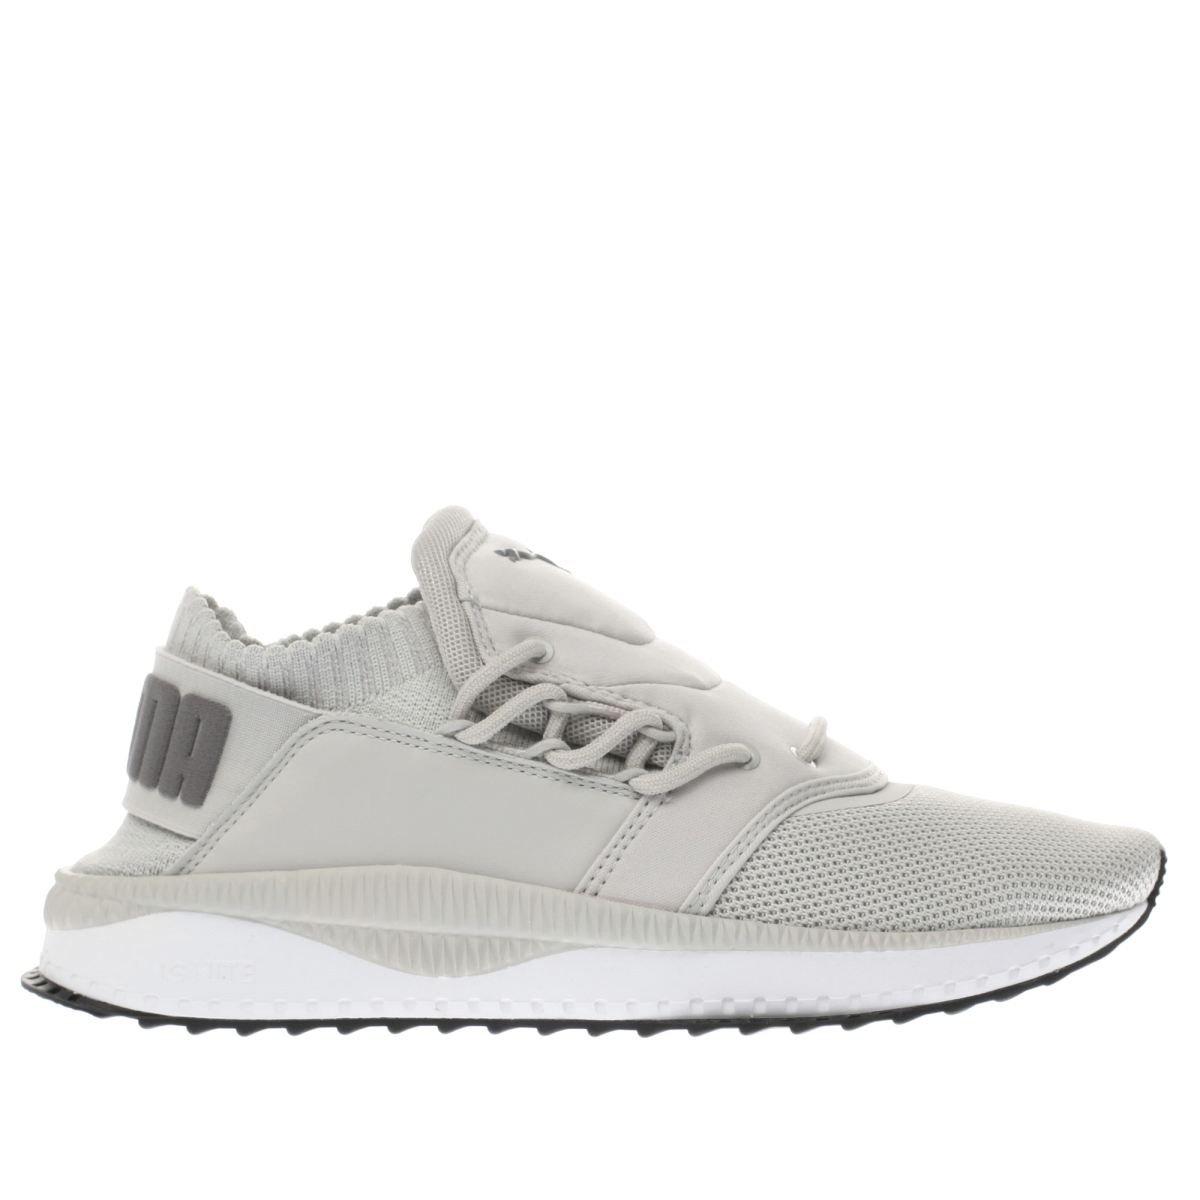 puma light grey tsugi shinsei trainers